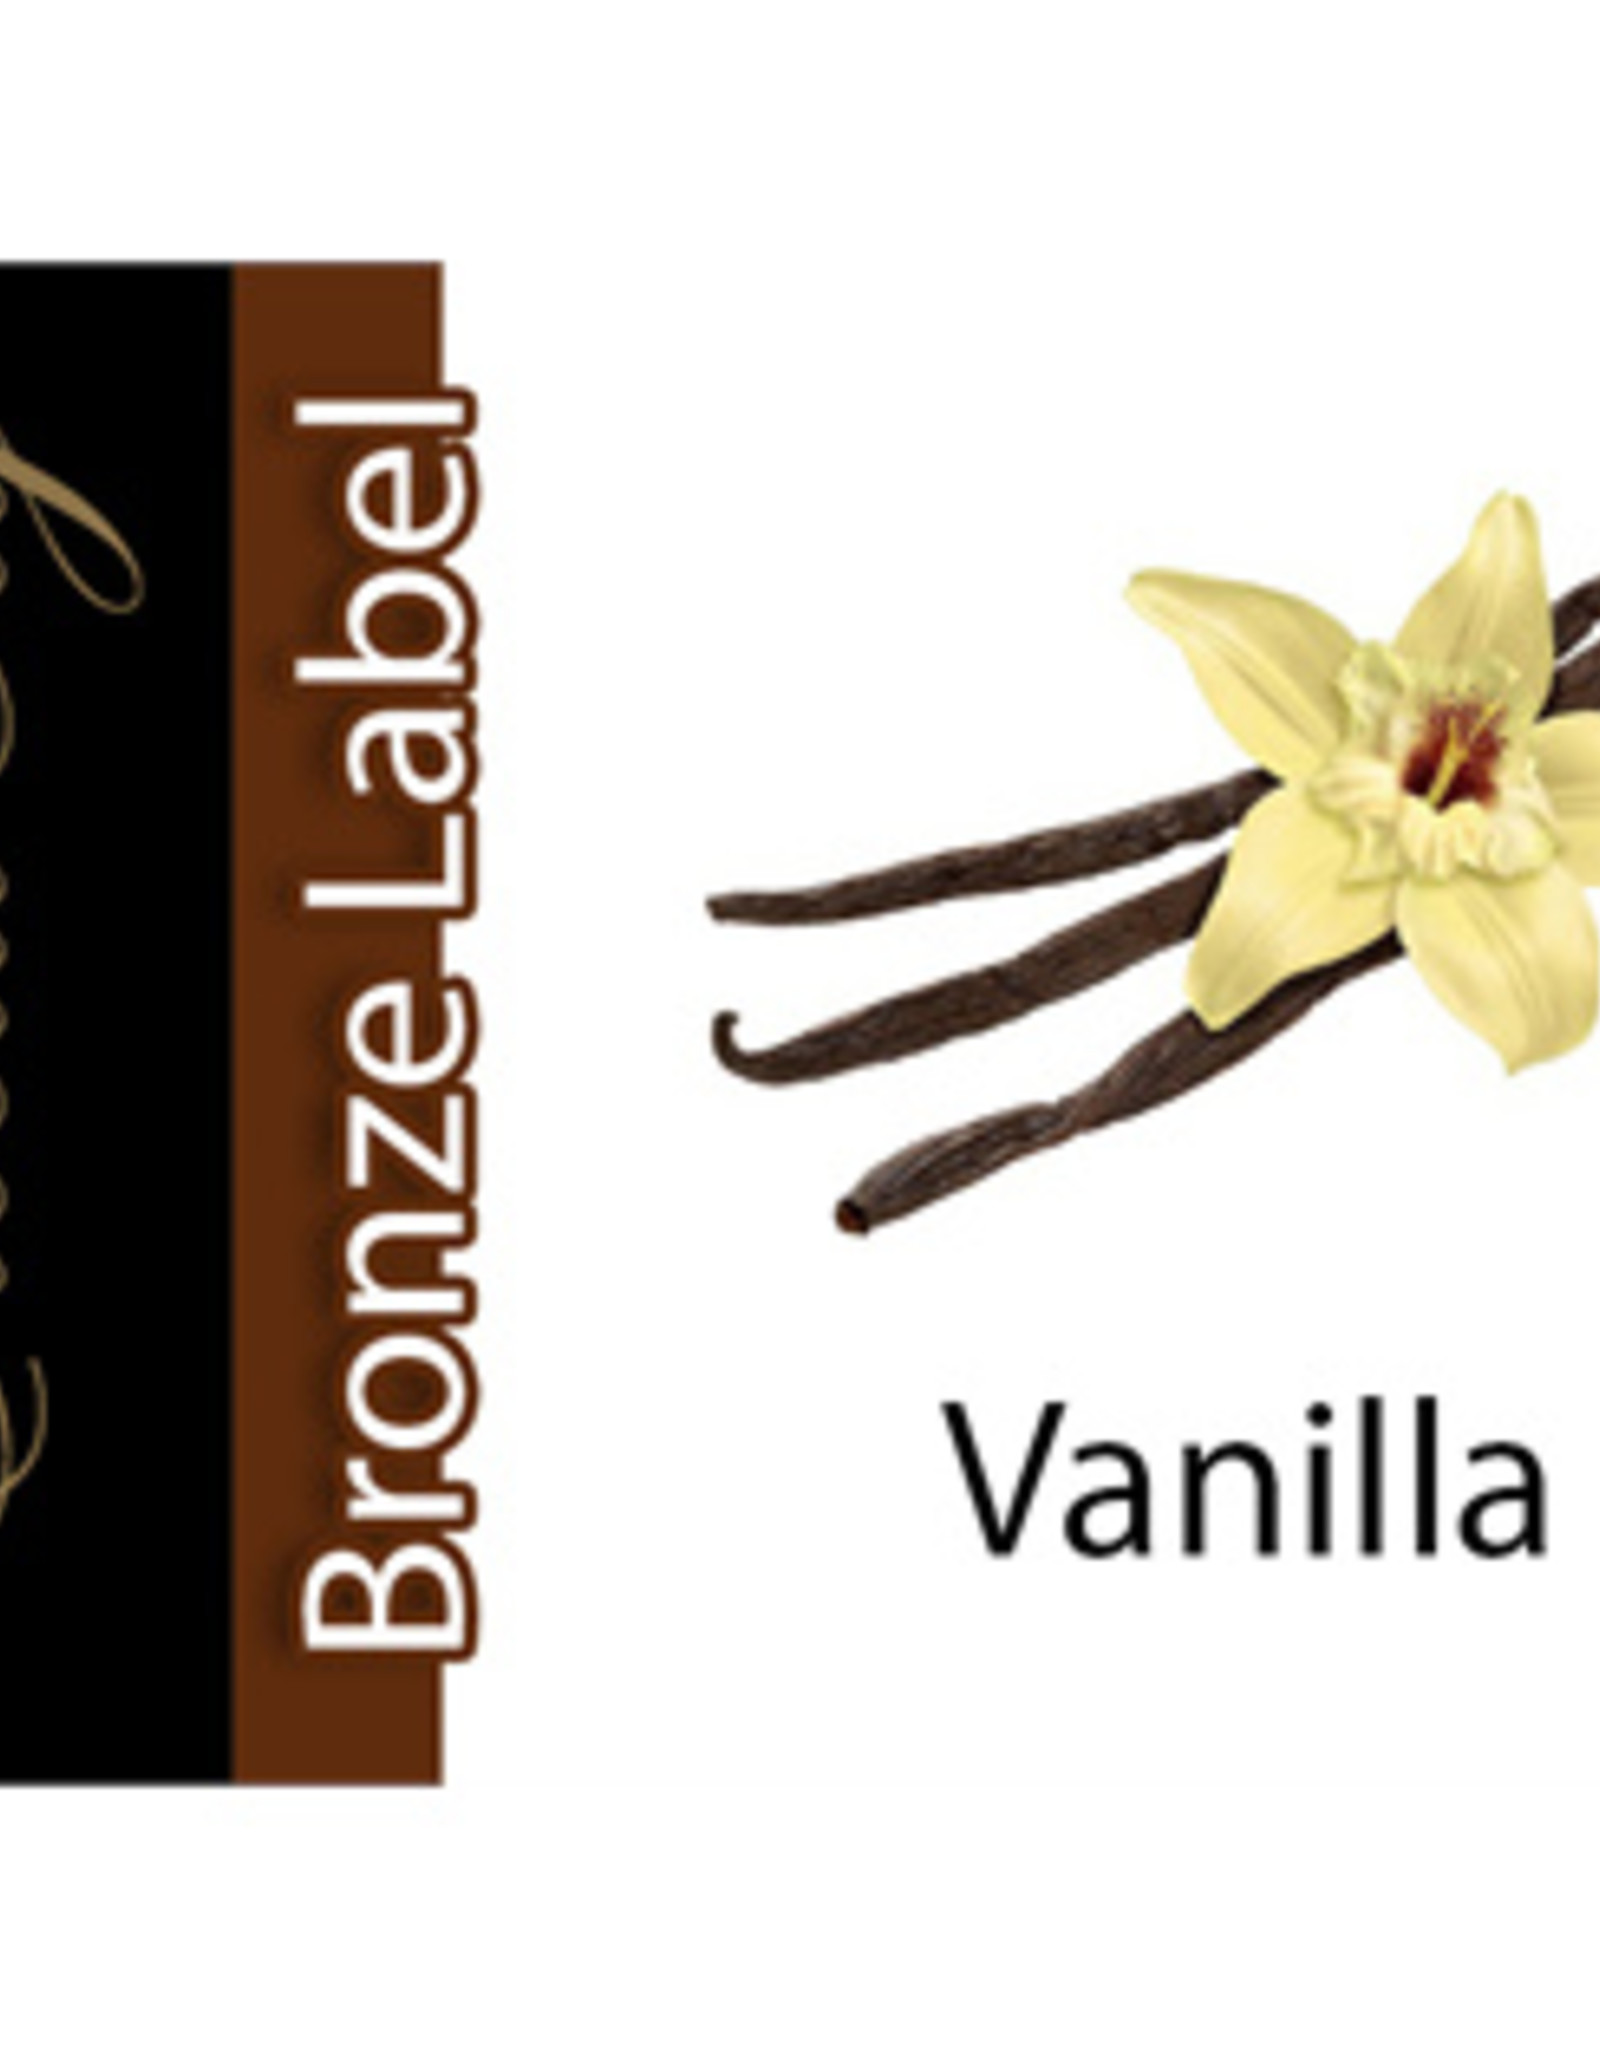 Exclucig Exclucig Bronze Label E-liquid Vanilla 3 mg Nicotine